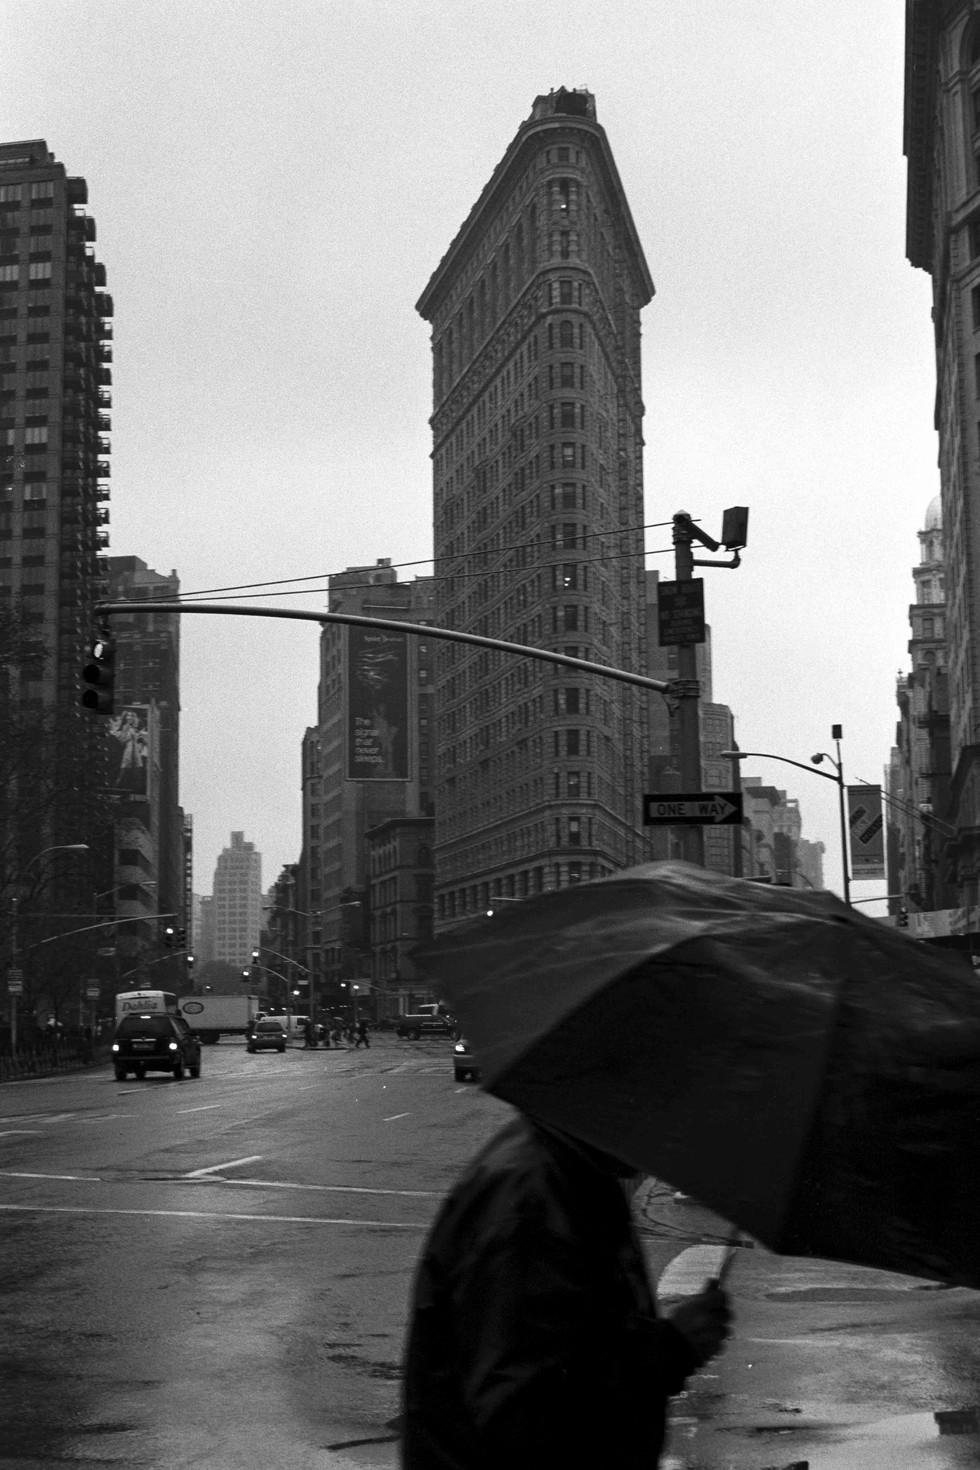 New York 2008 • Flat iron